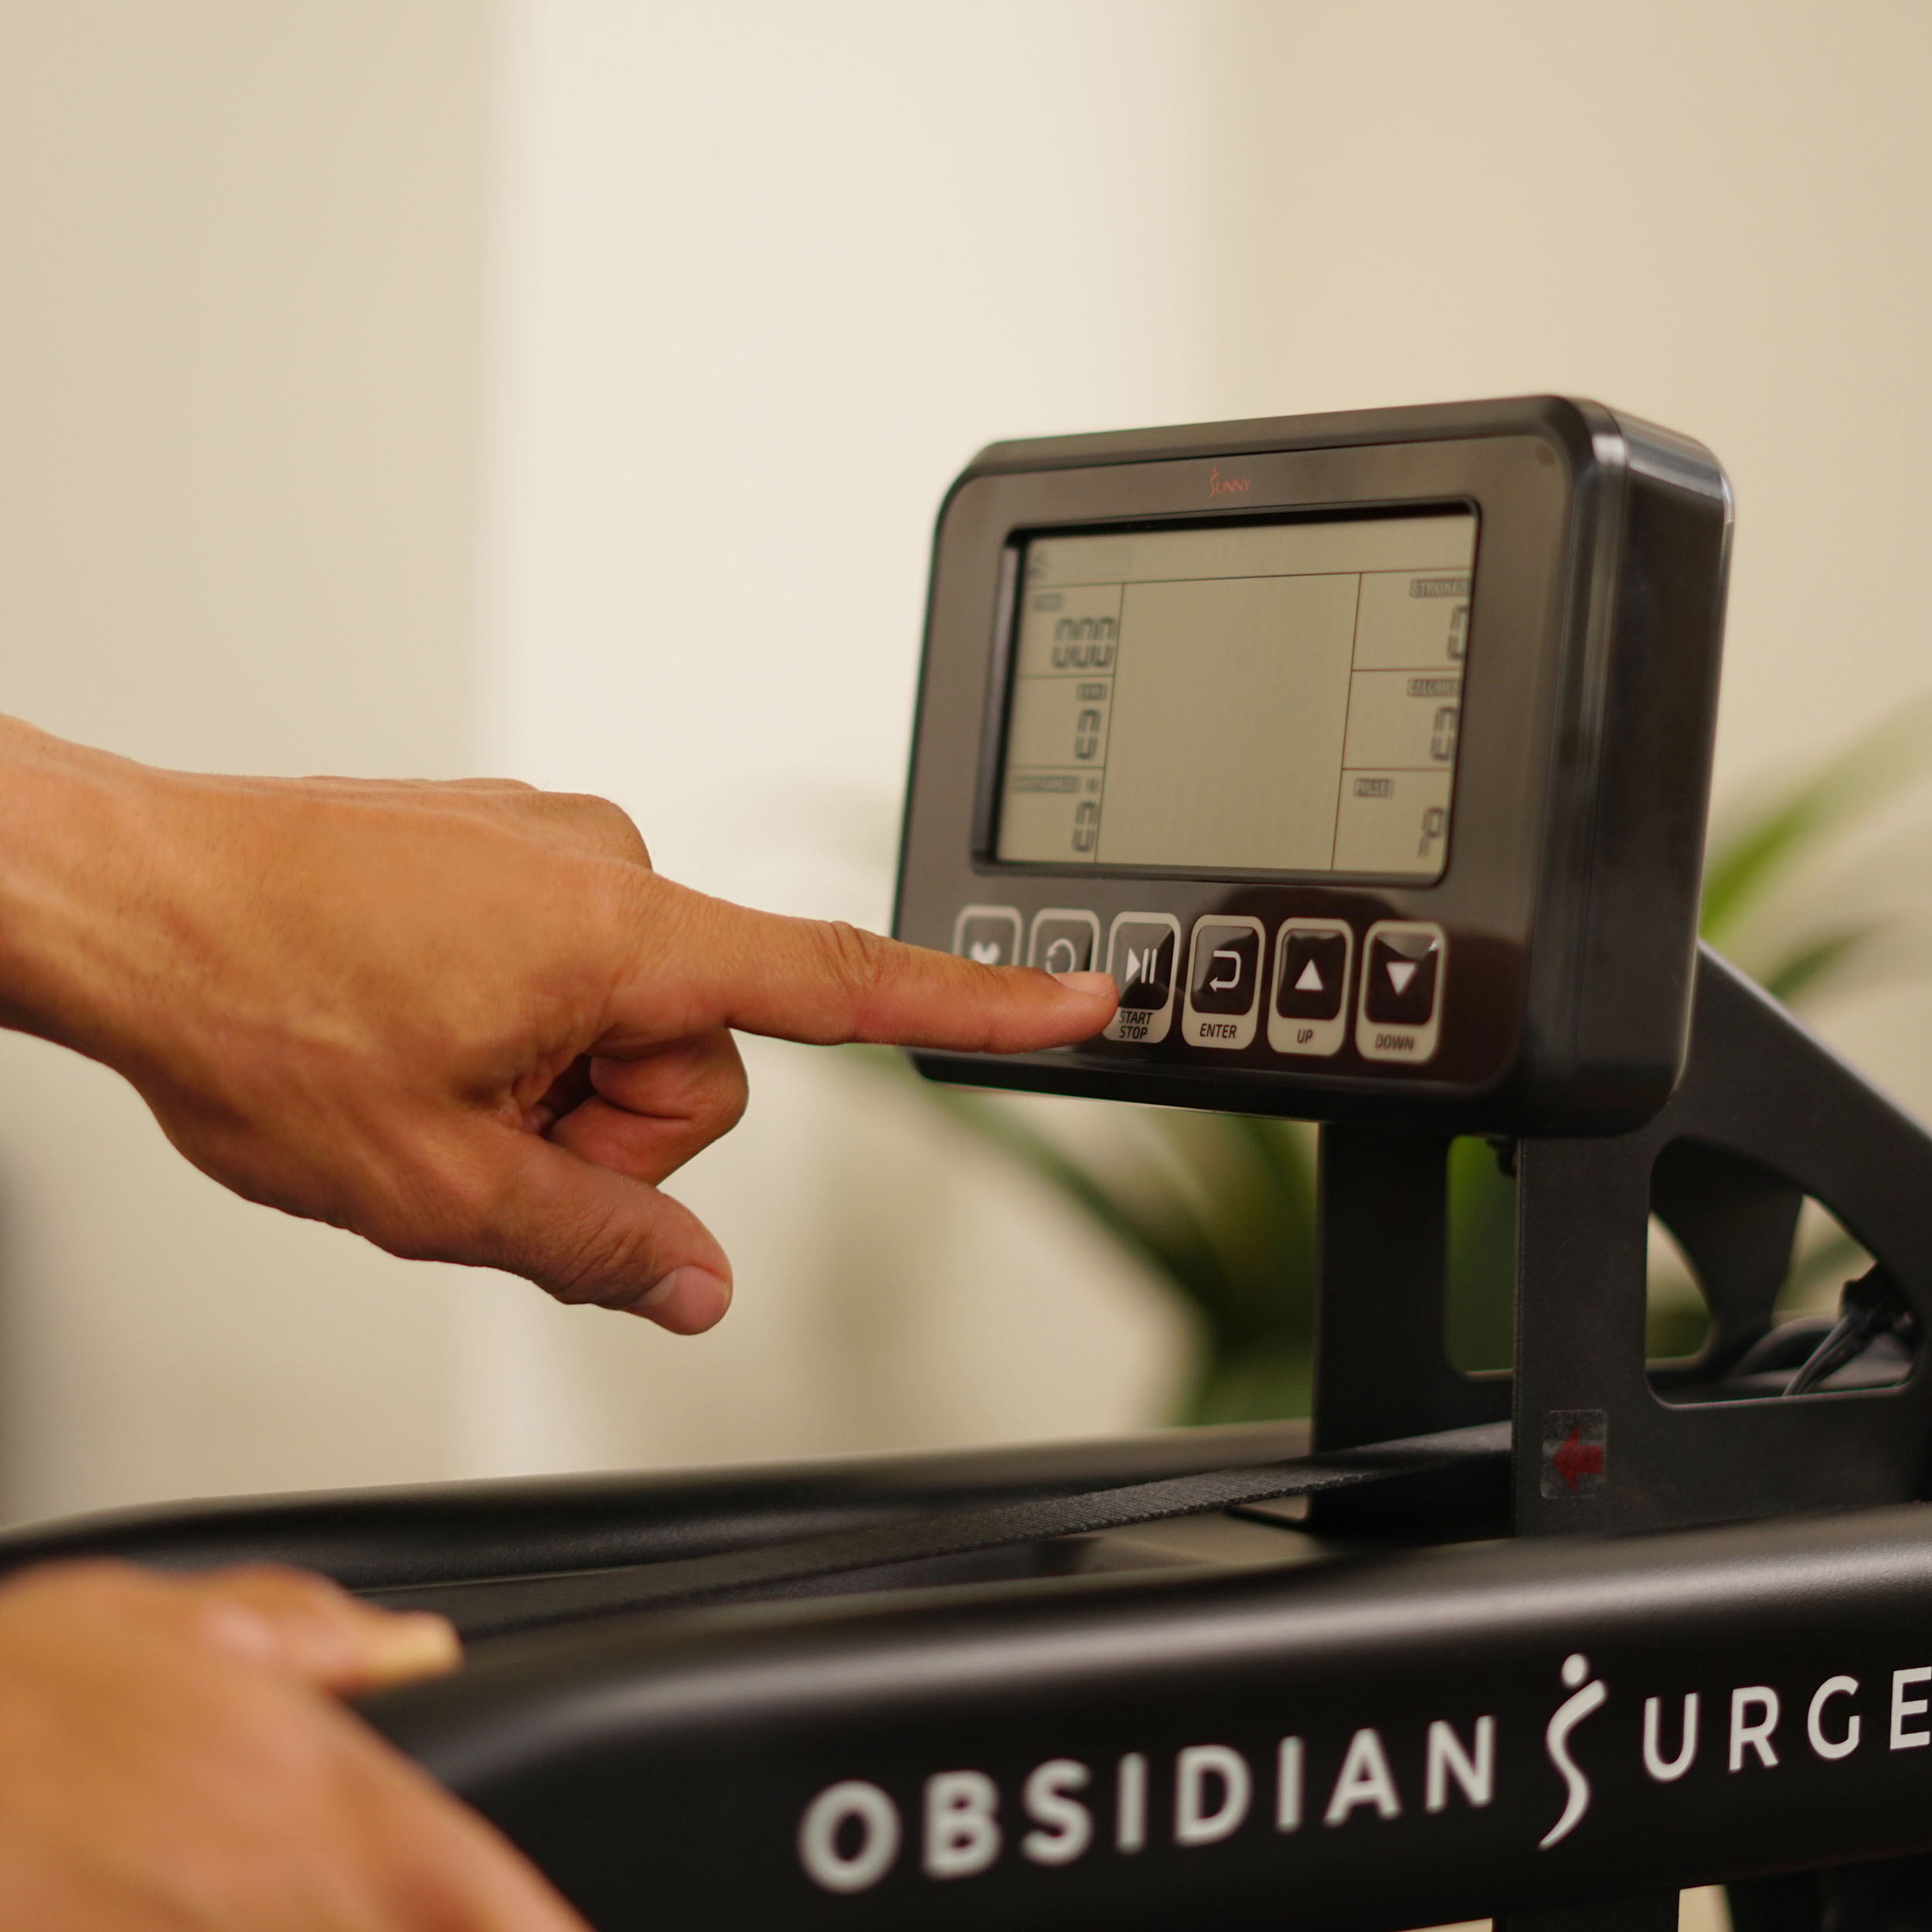 Sunny Health & Fitness Obsidian Surge Water Rowing Machine Sf-rw5713